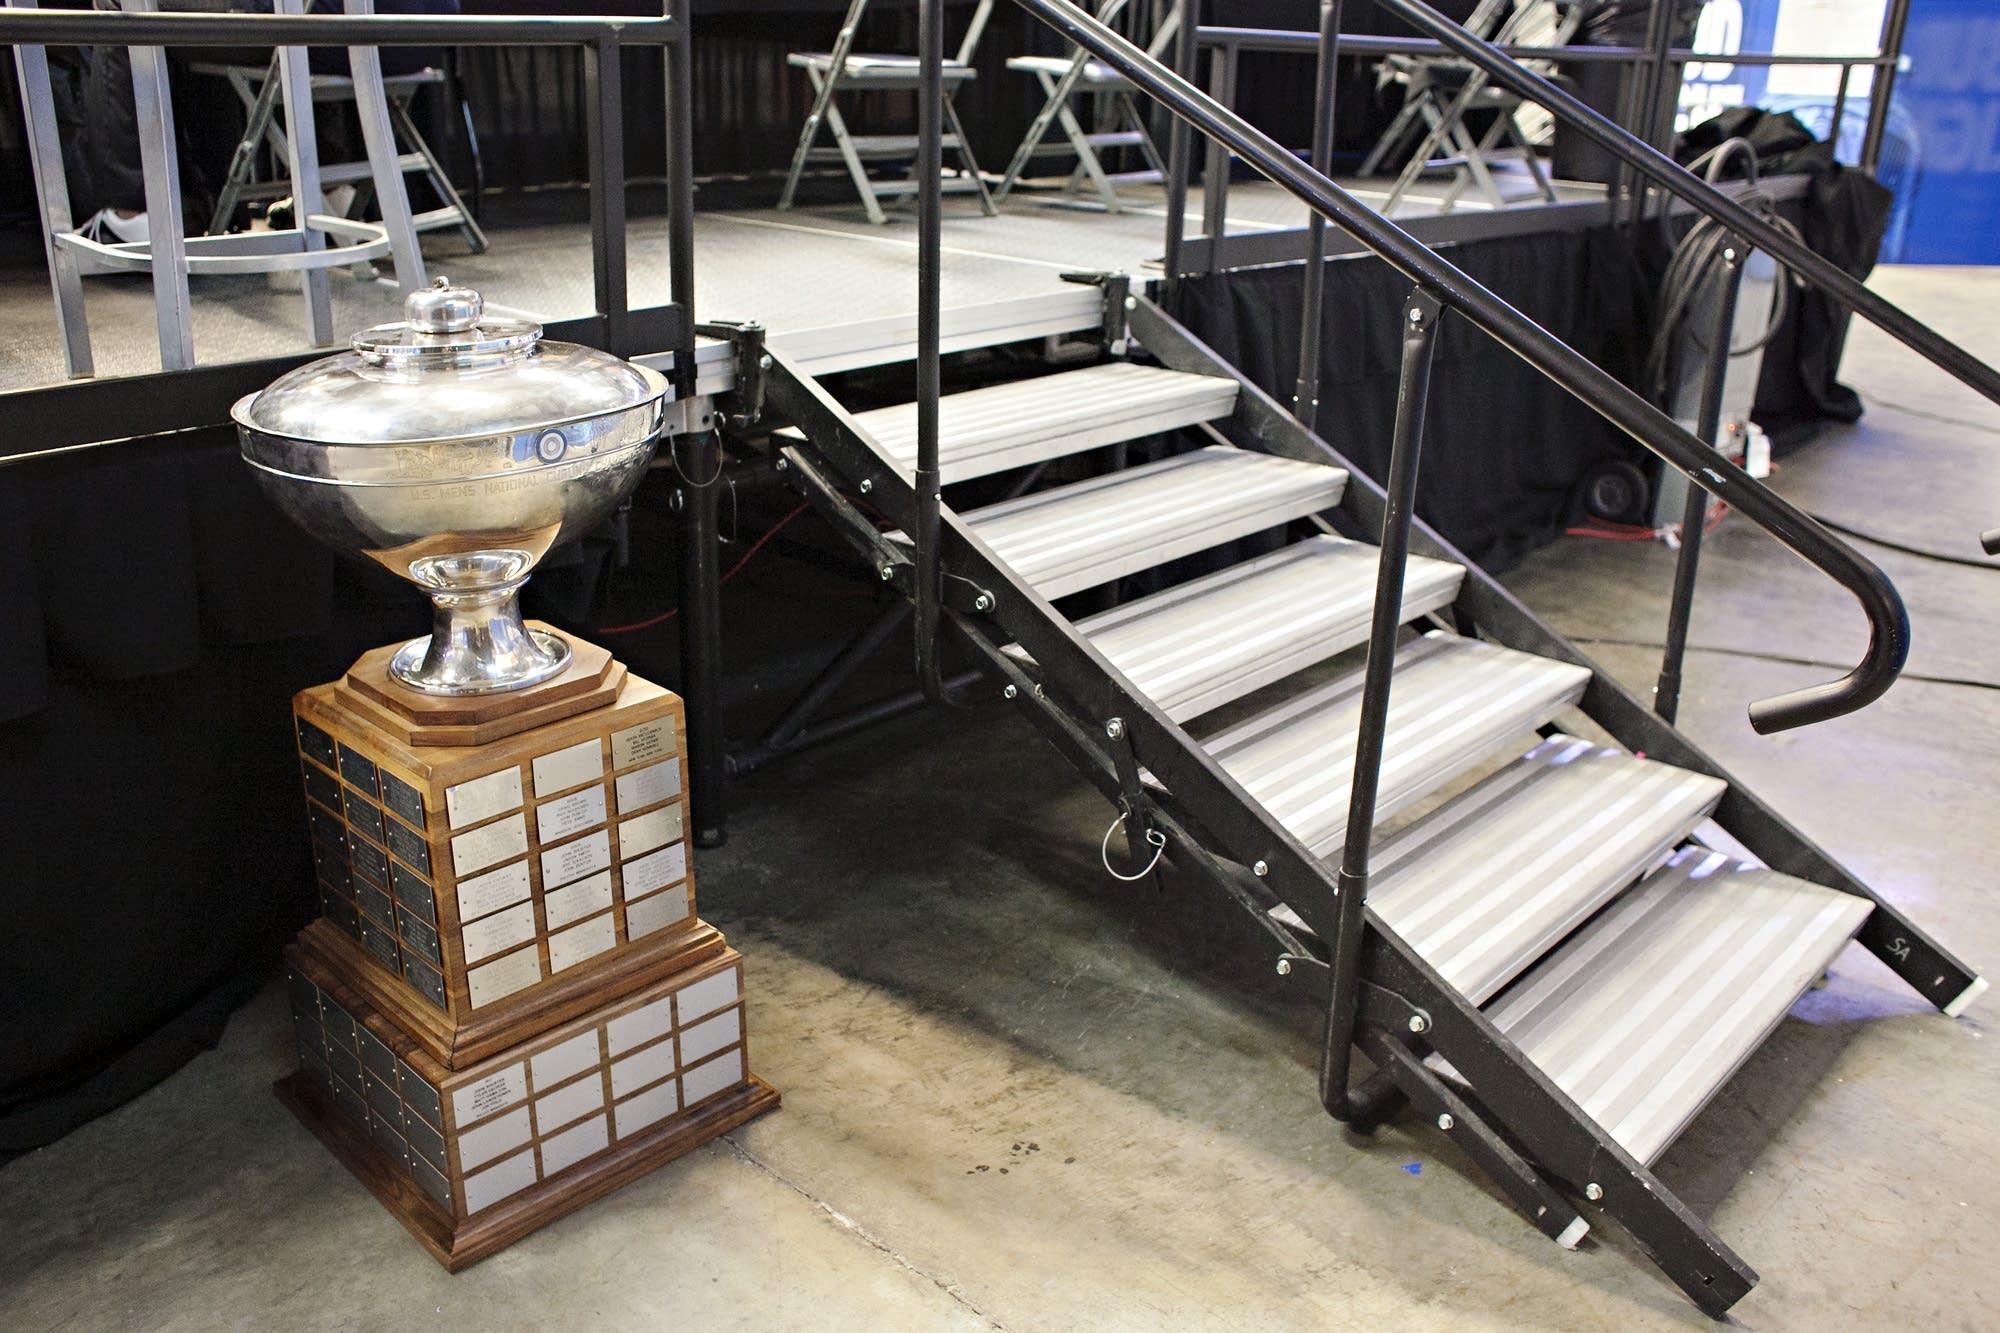 The U.S. Men's National Curling Championship trophy